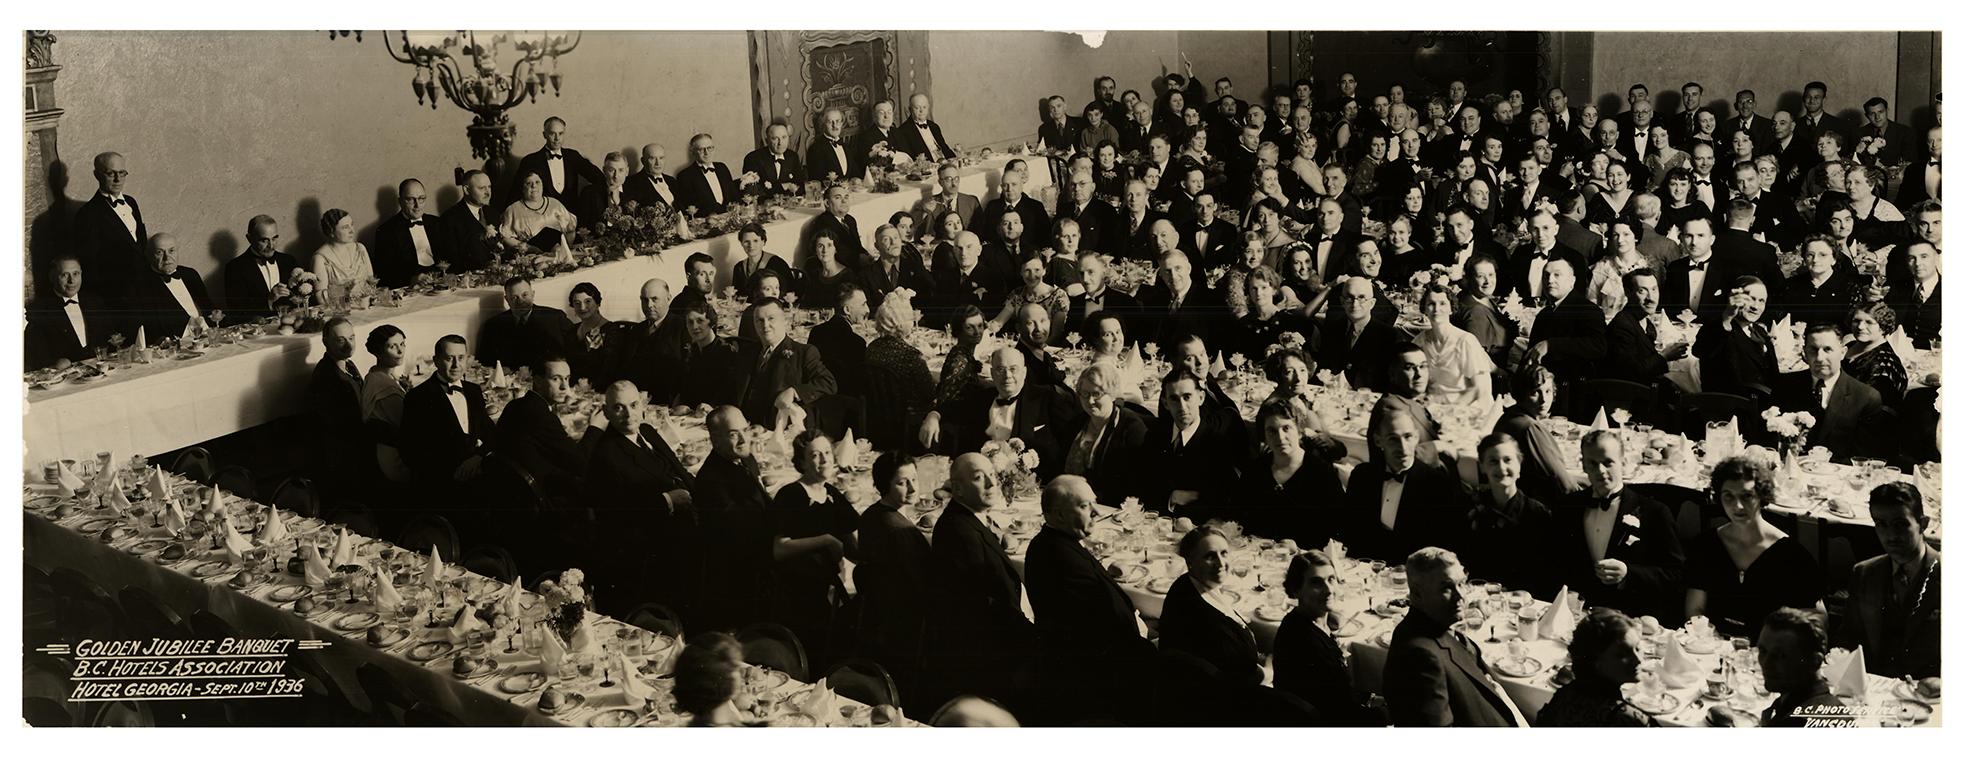 BCHA Golden Jubilee Banquet, 1936